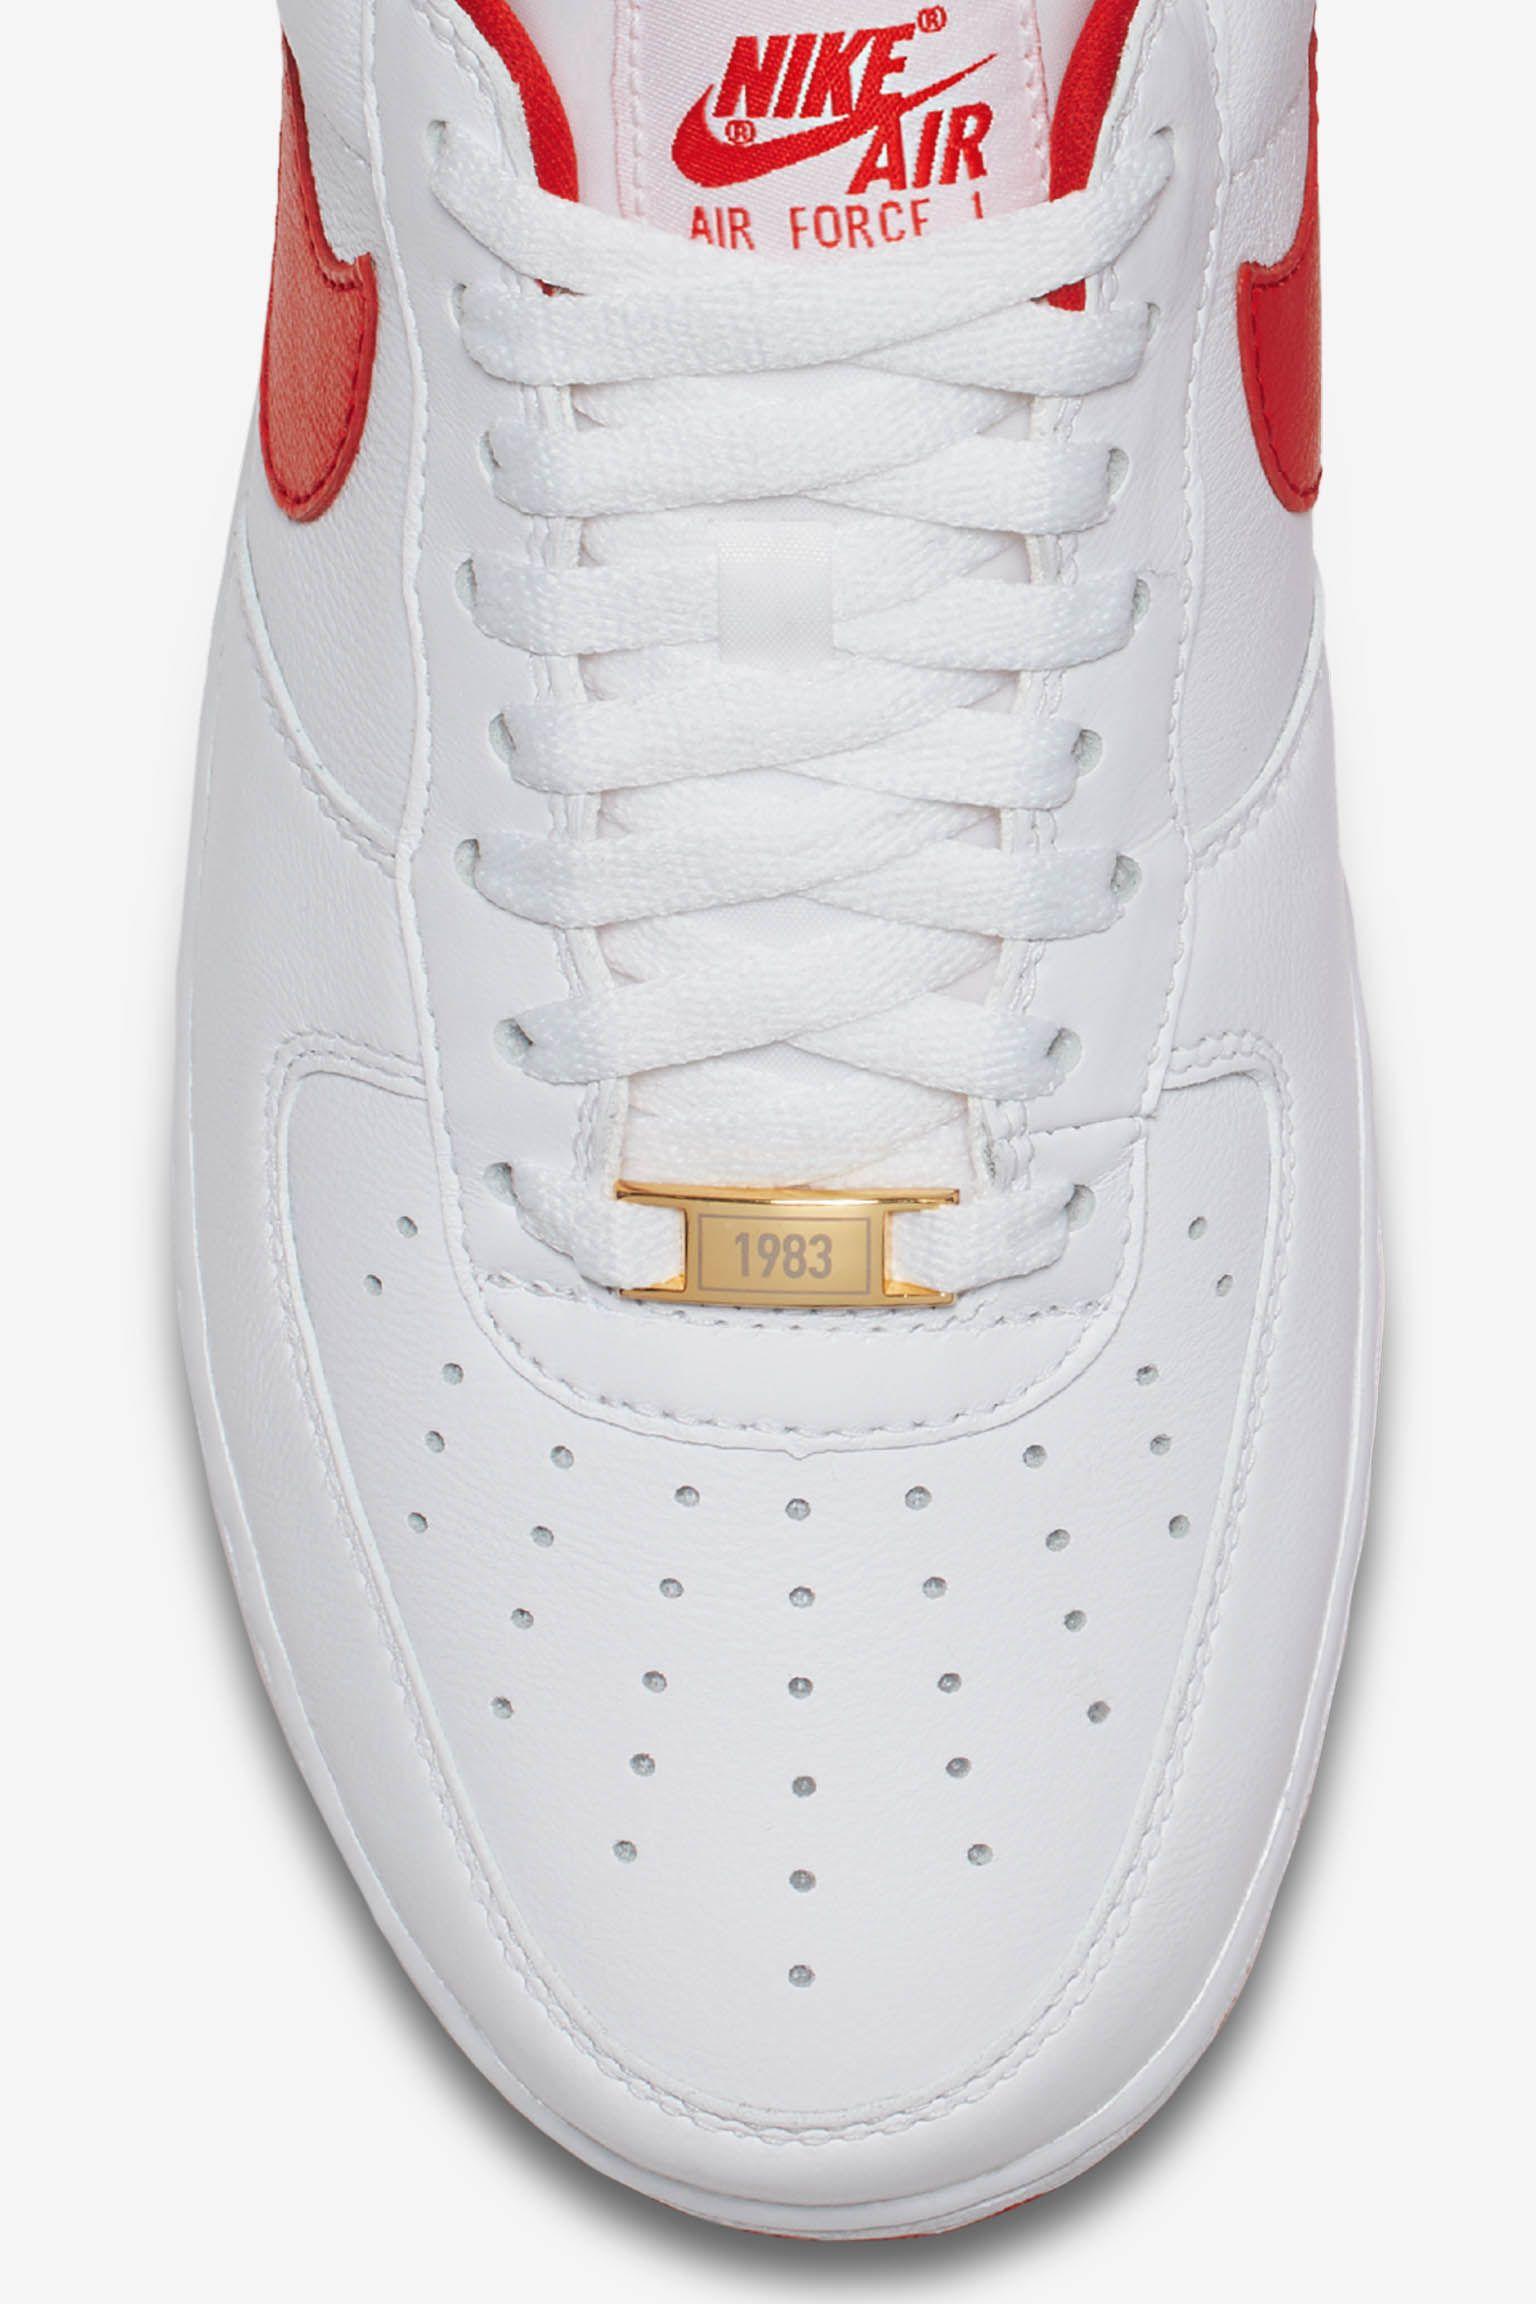 fec703b78221e Date 1  fo  Release Low Of Art Force Fi  Air Fo   Champion A Nike qTOwB7Hxq